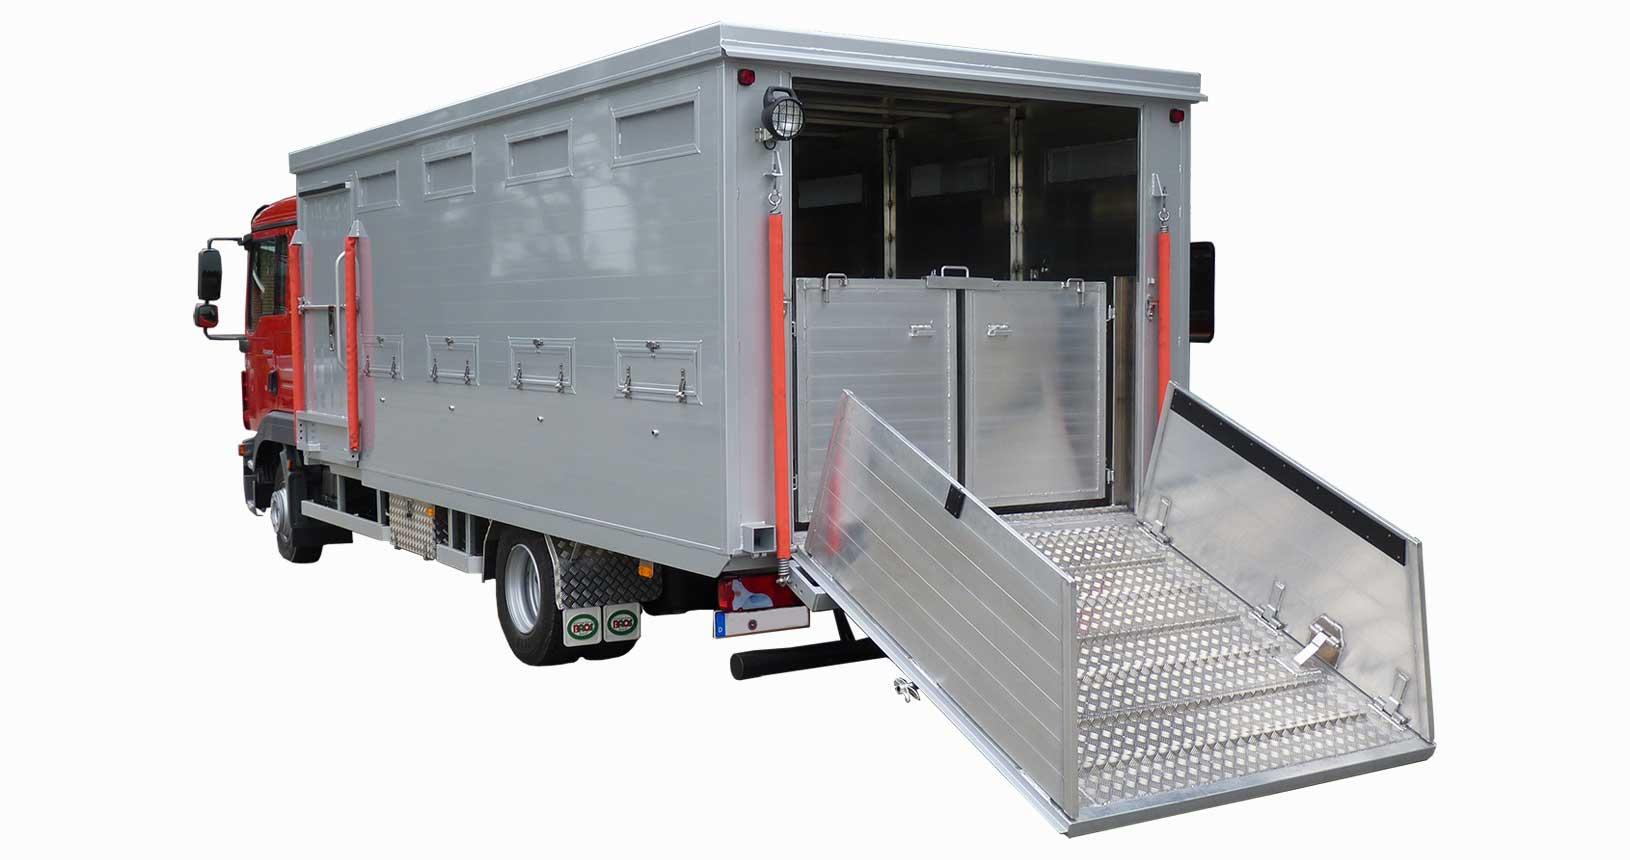 Viehtransporter LKW Rinder Kälber